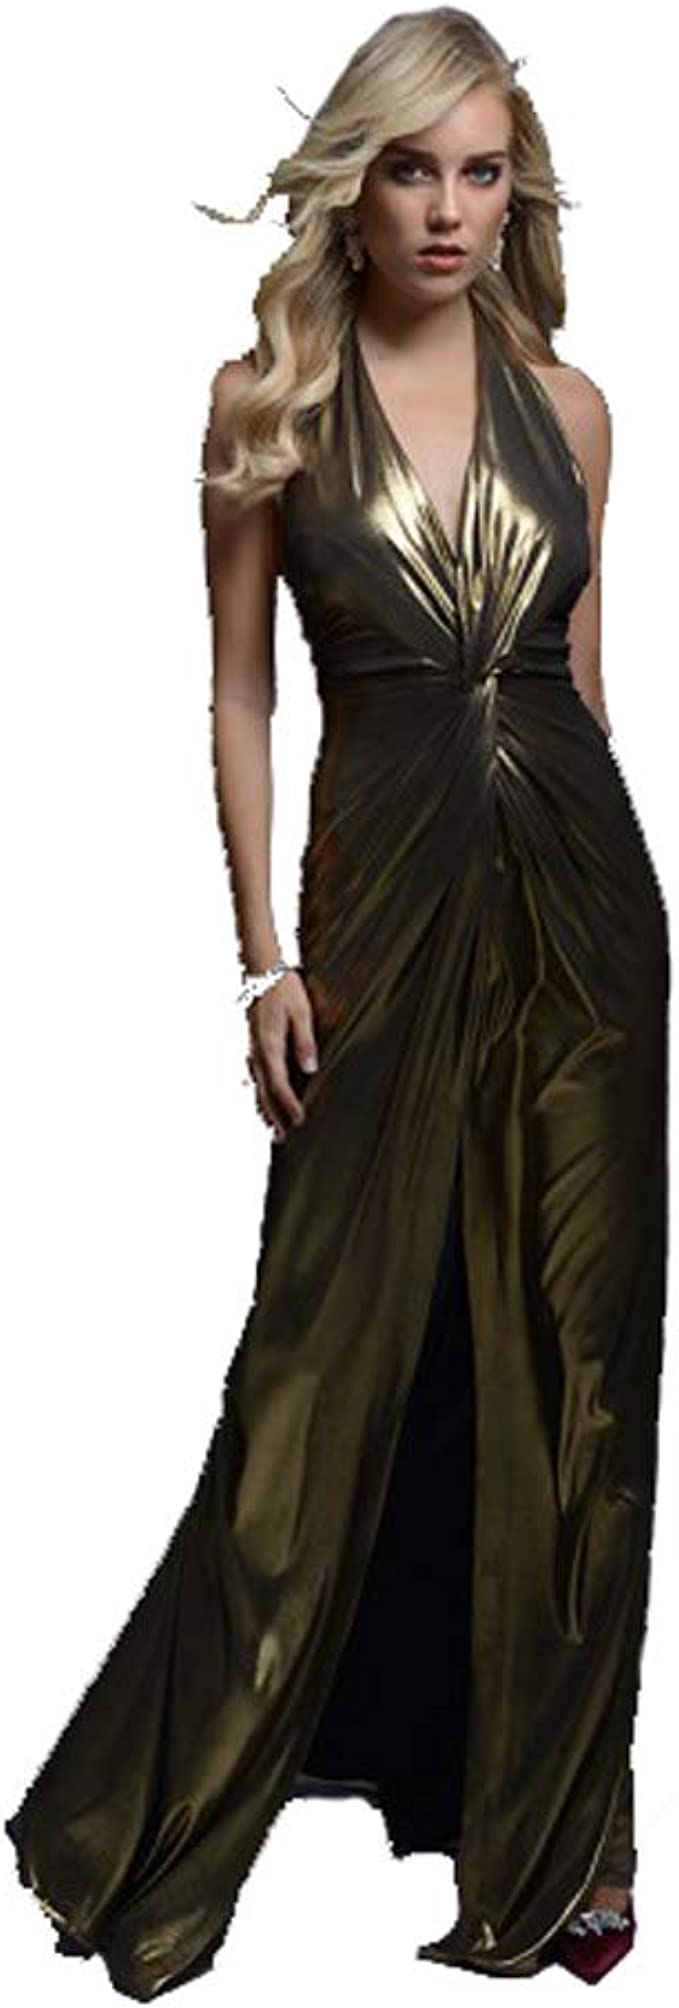 WEDDINESS Langes Kleid mit Metalware, vergoldet, Modell SENSIL